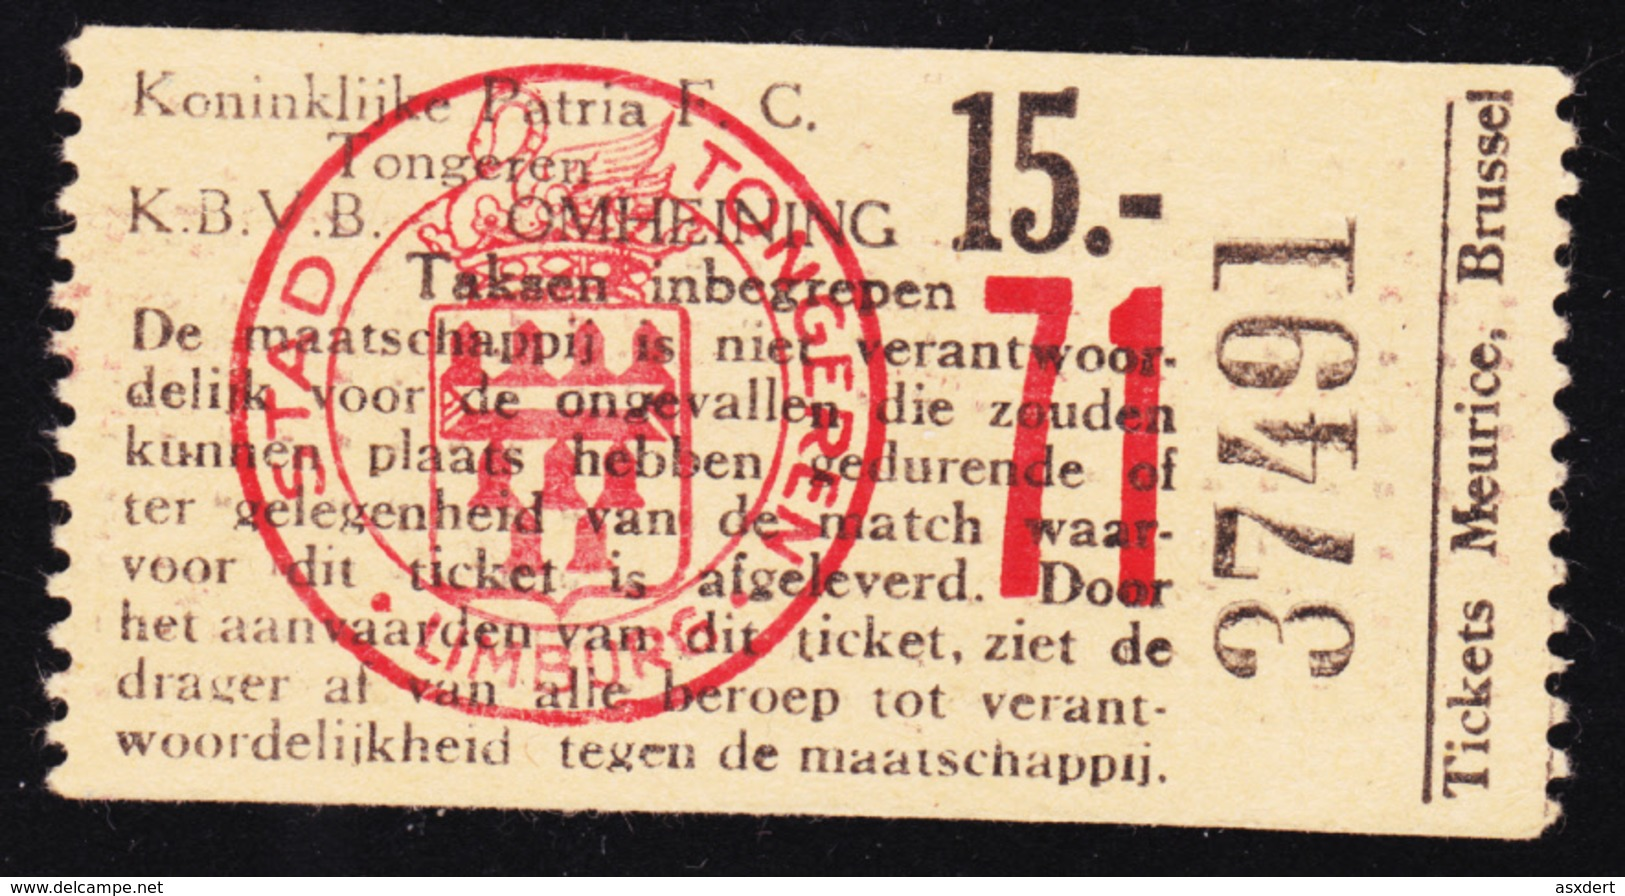 TICKET - VOETBAL - FOOTBALL - KONINKLIJKE PATRIA F.C. TONGEREN -  Stamnr.71 - Tickets D'entrée